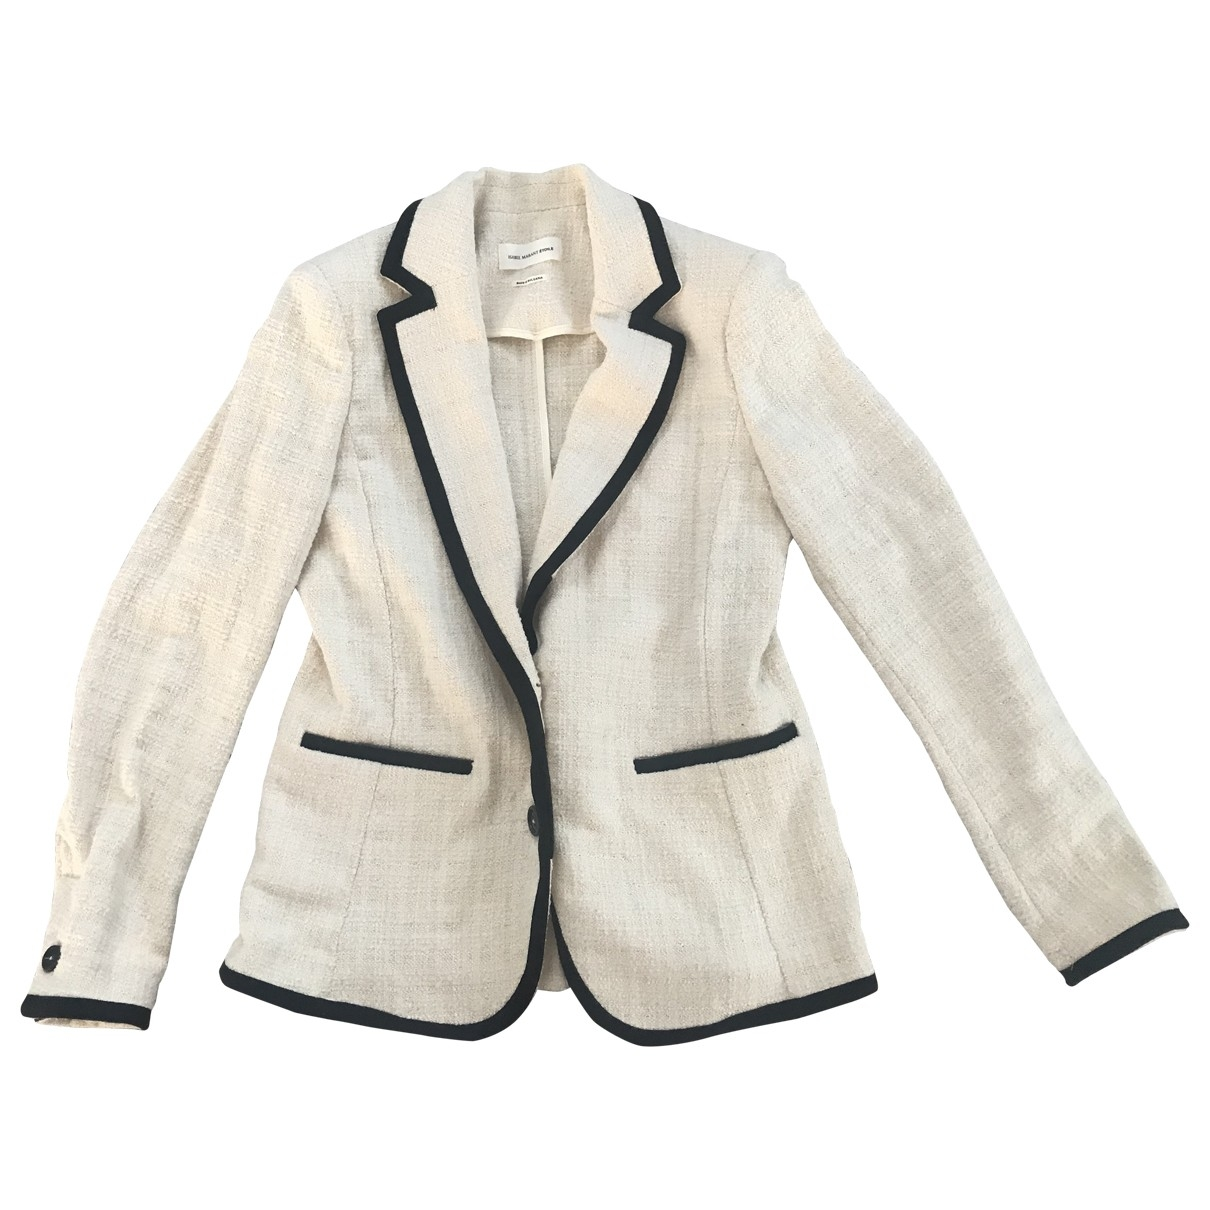 Isabel Marant Etoile \N Ecru Cotton jacket for Women 38 FR